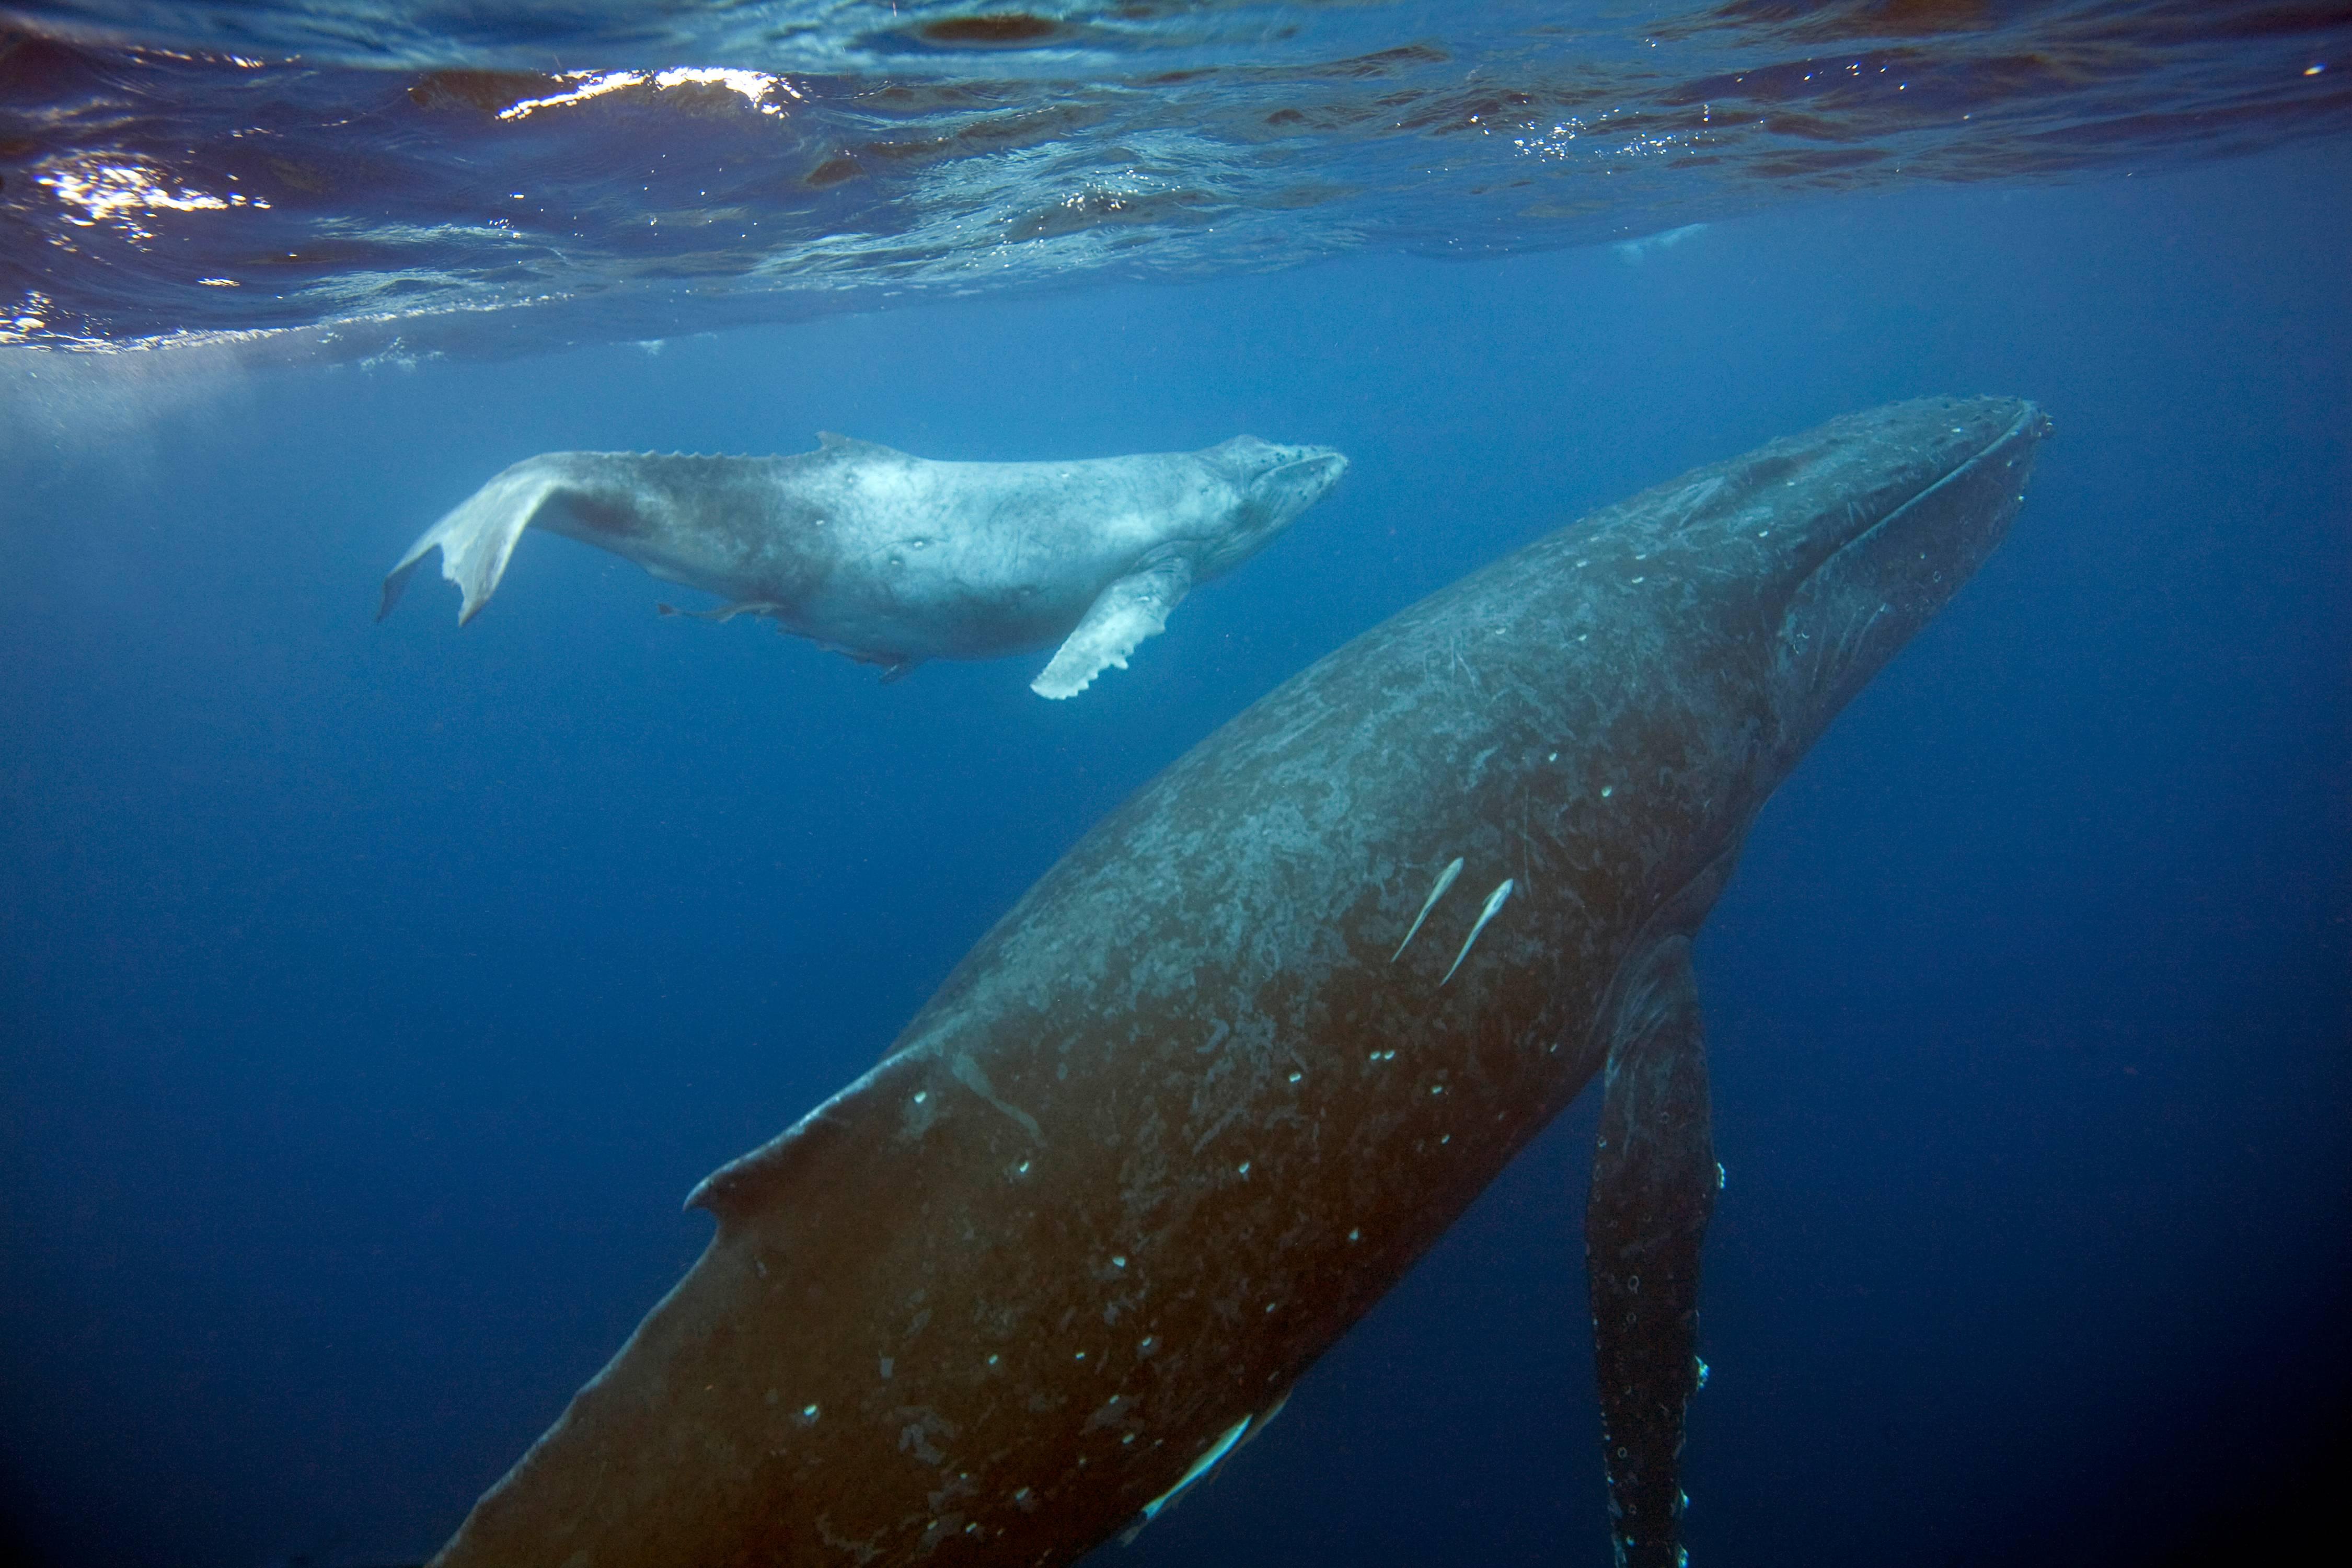 Humpback Whale Mother and Calf, Kingdom of Tonga